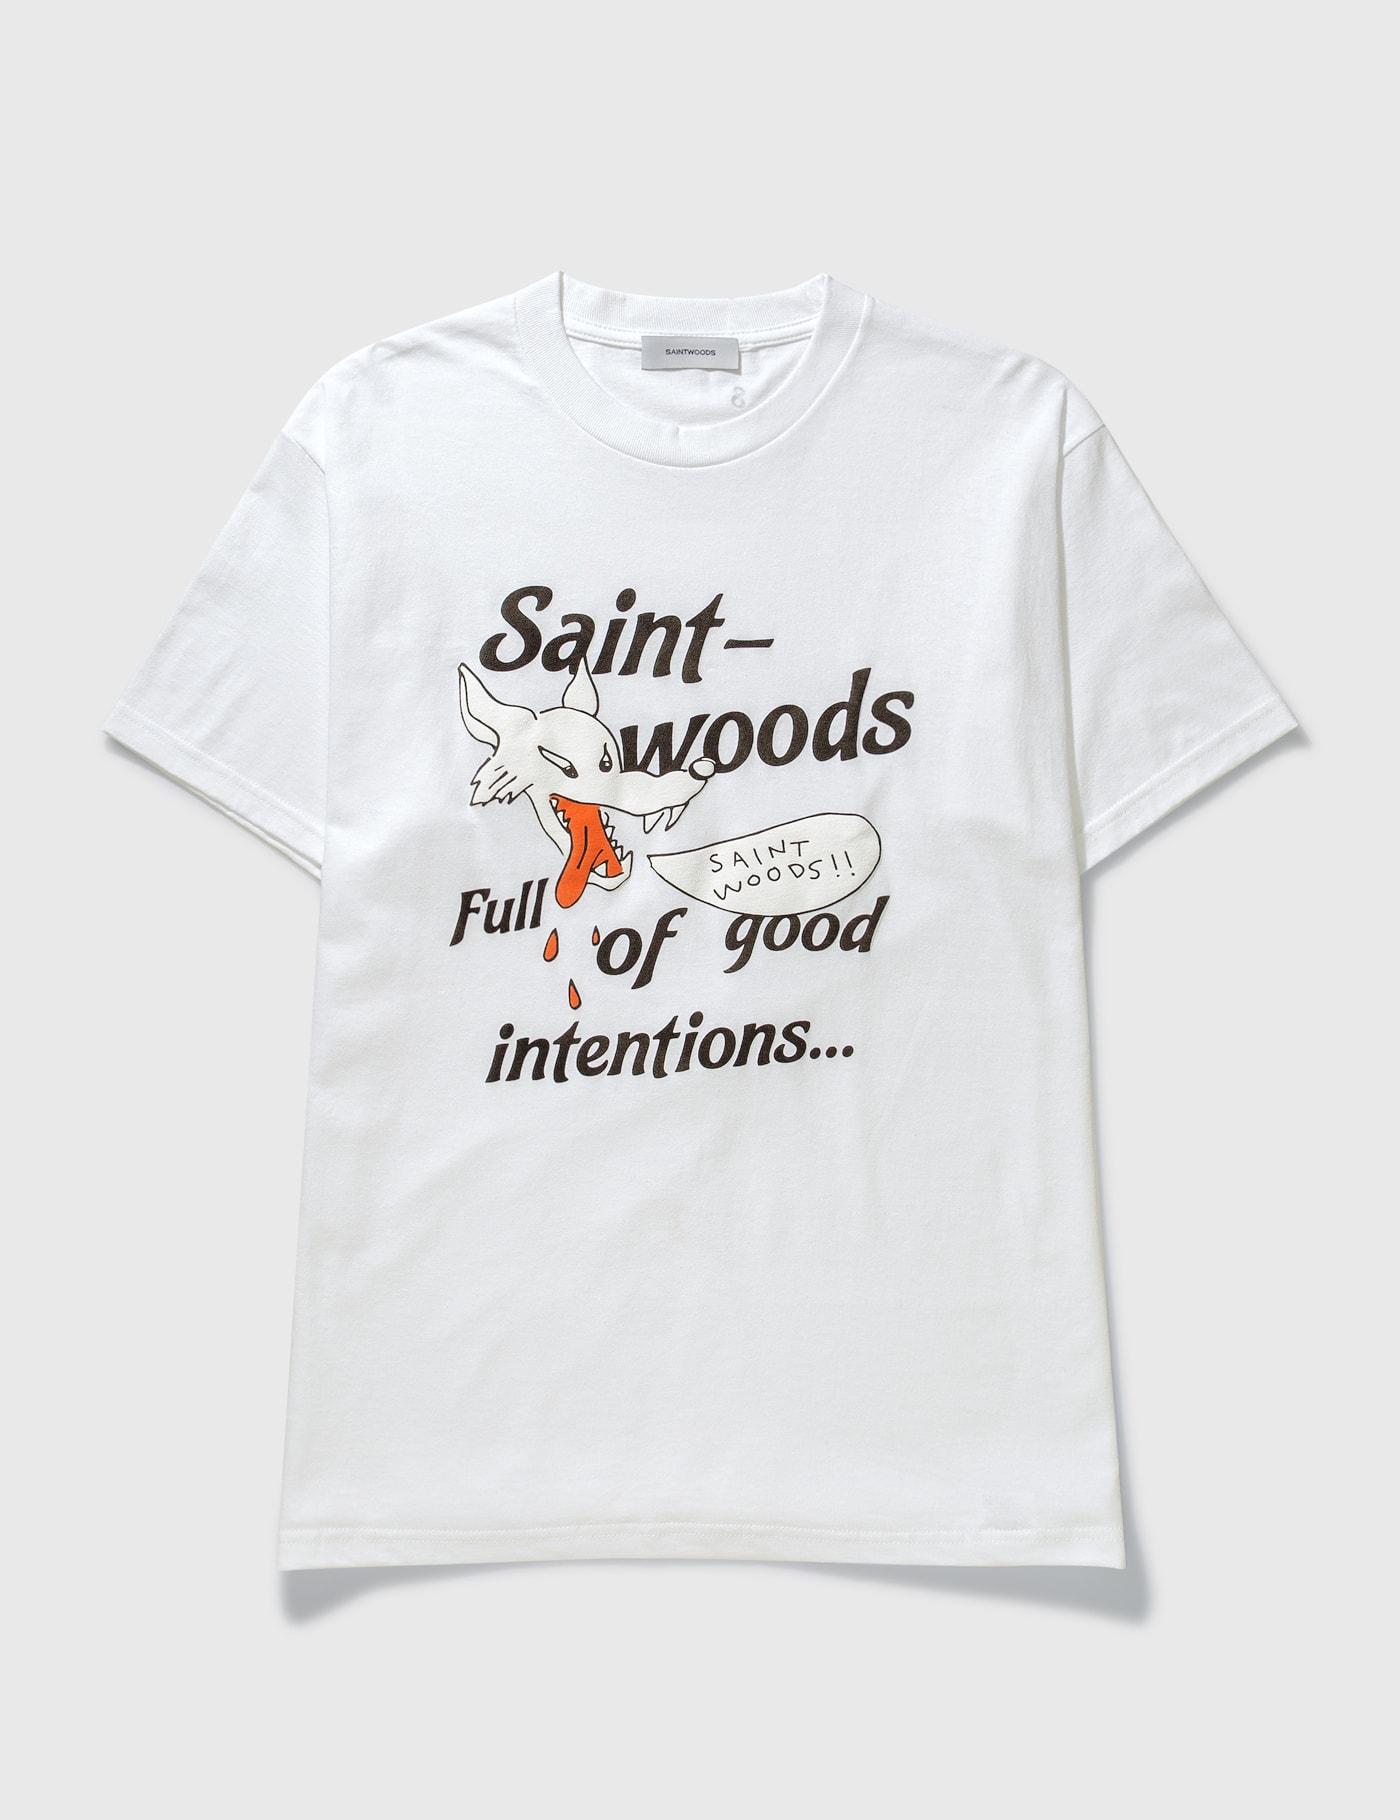 Saintwoods WOLF T-SHIRT